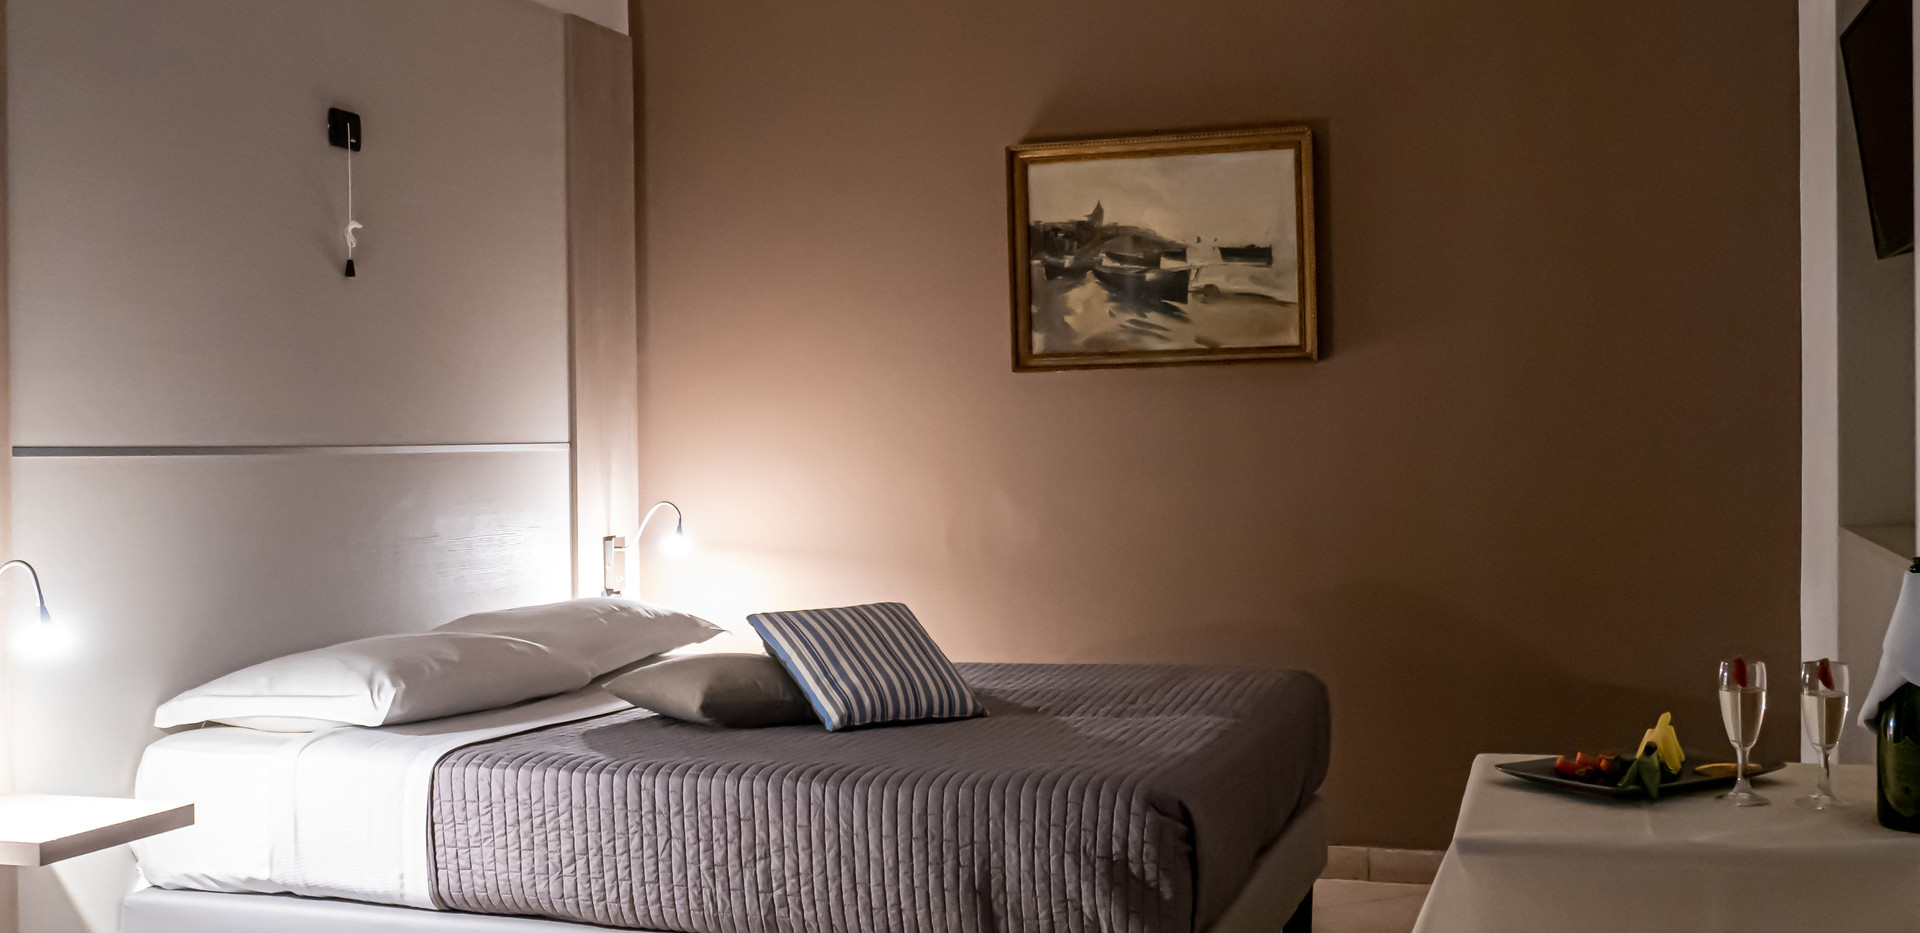 Hotel san Marco - Double Room - 3.jpg